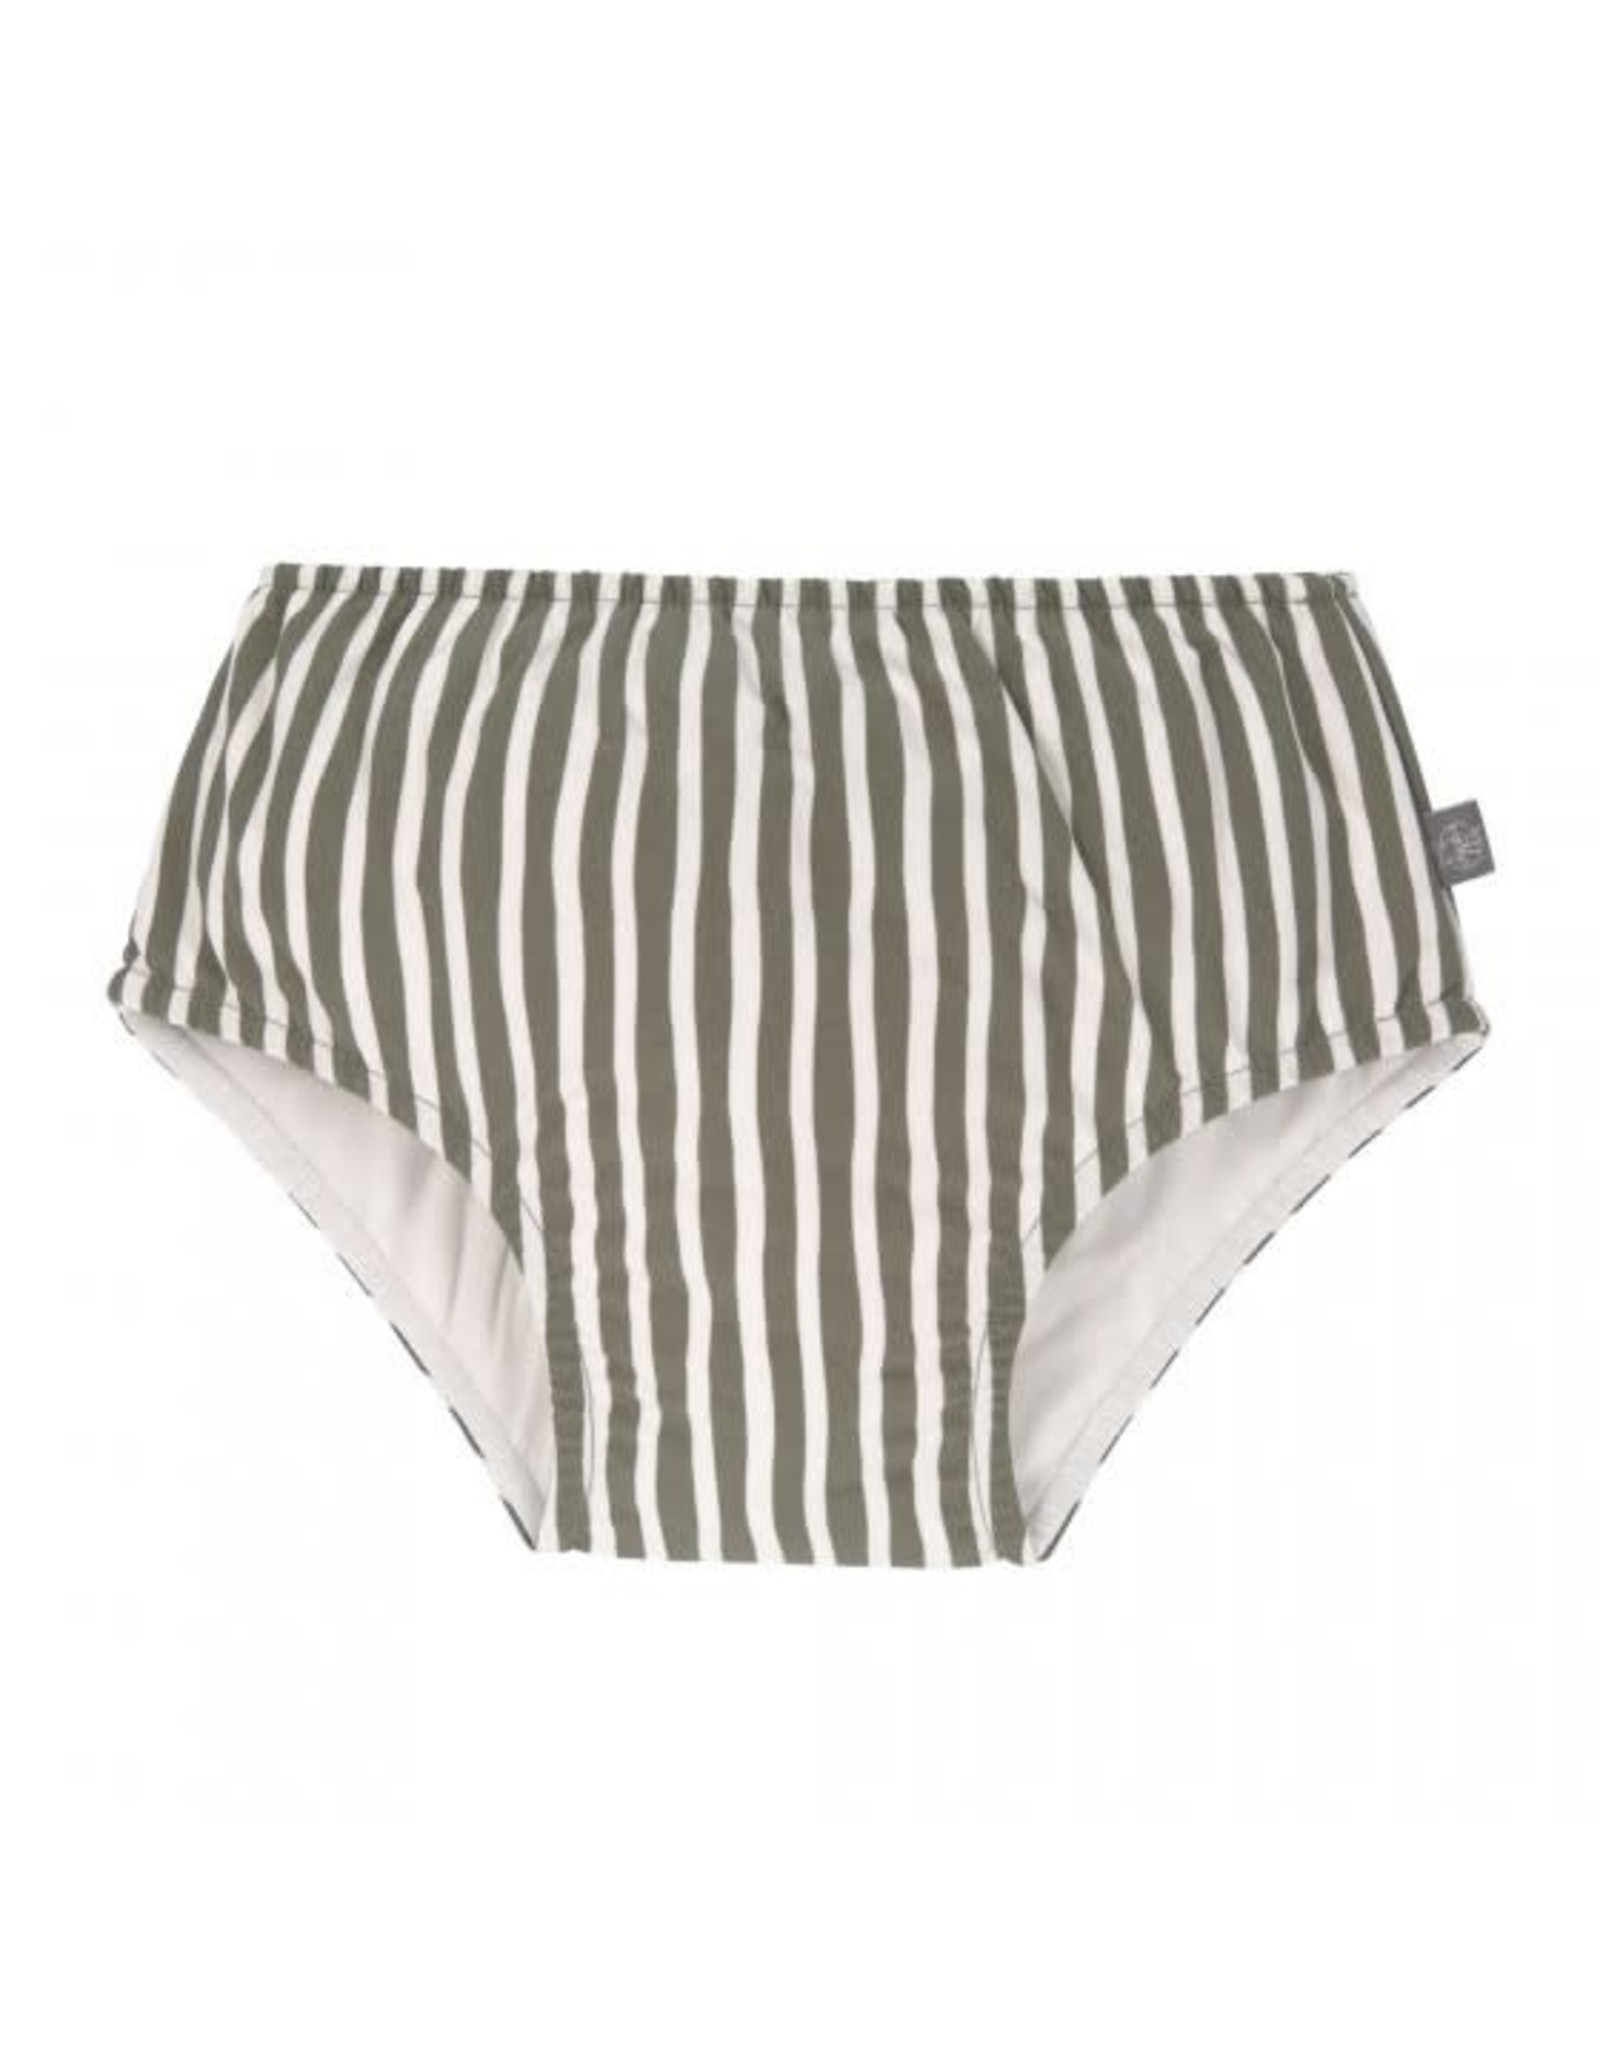 Lassig Lassig Swim Diaper Boys Stripes Olive